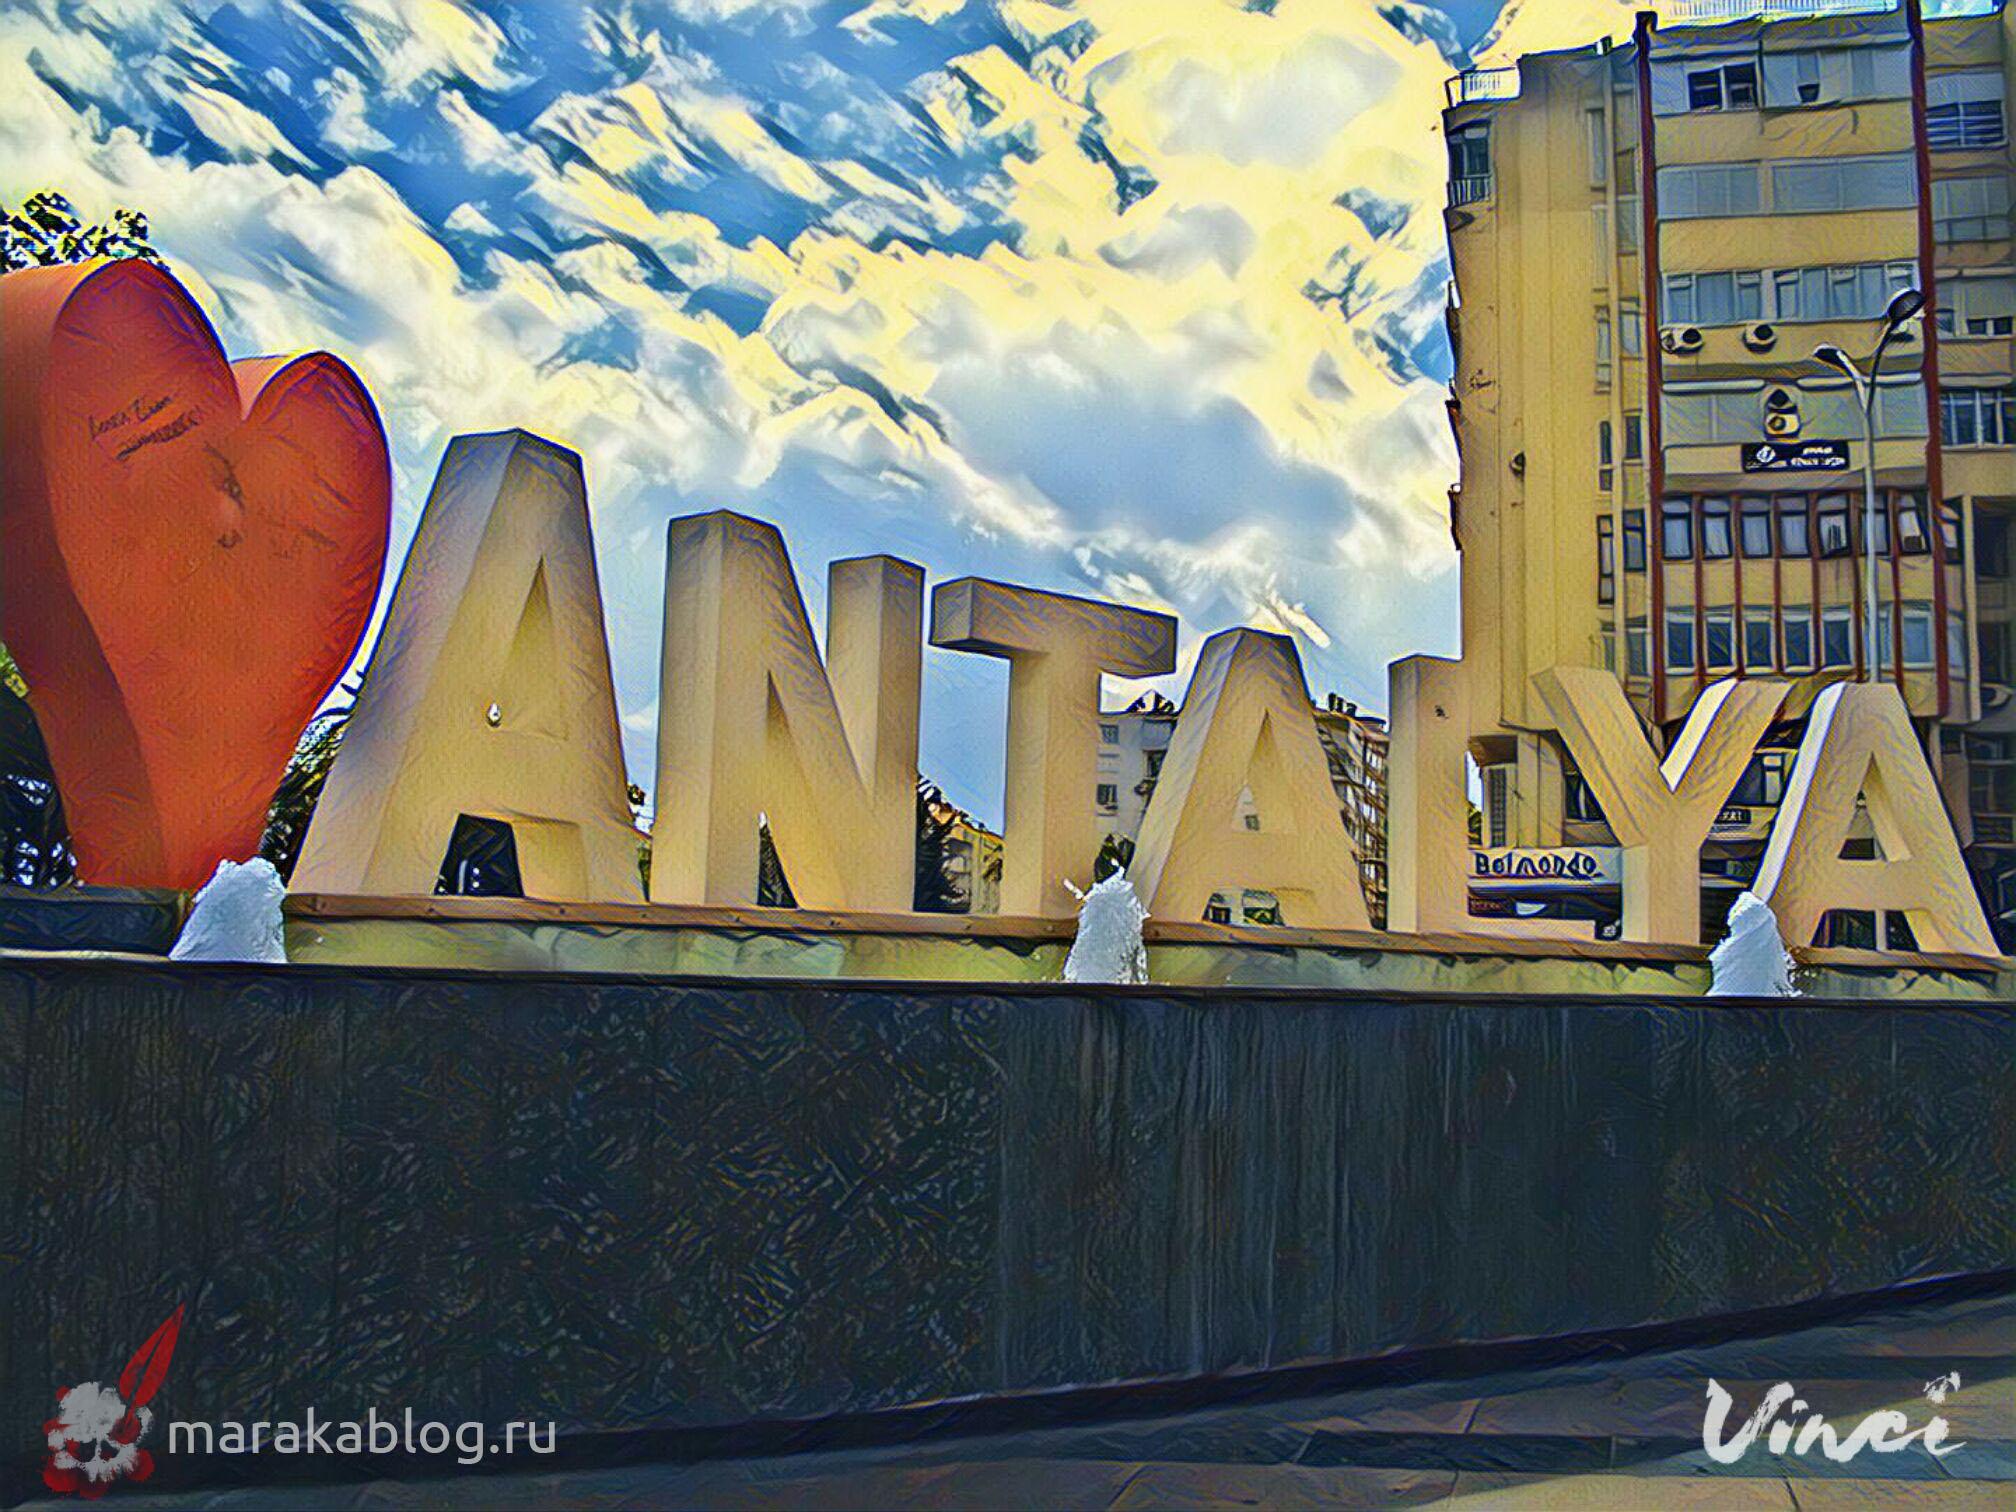 Фото фонтана I love Antalya в центре Анталии